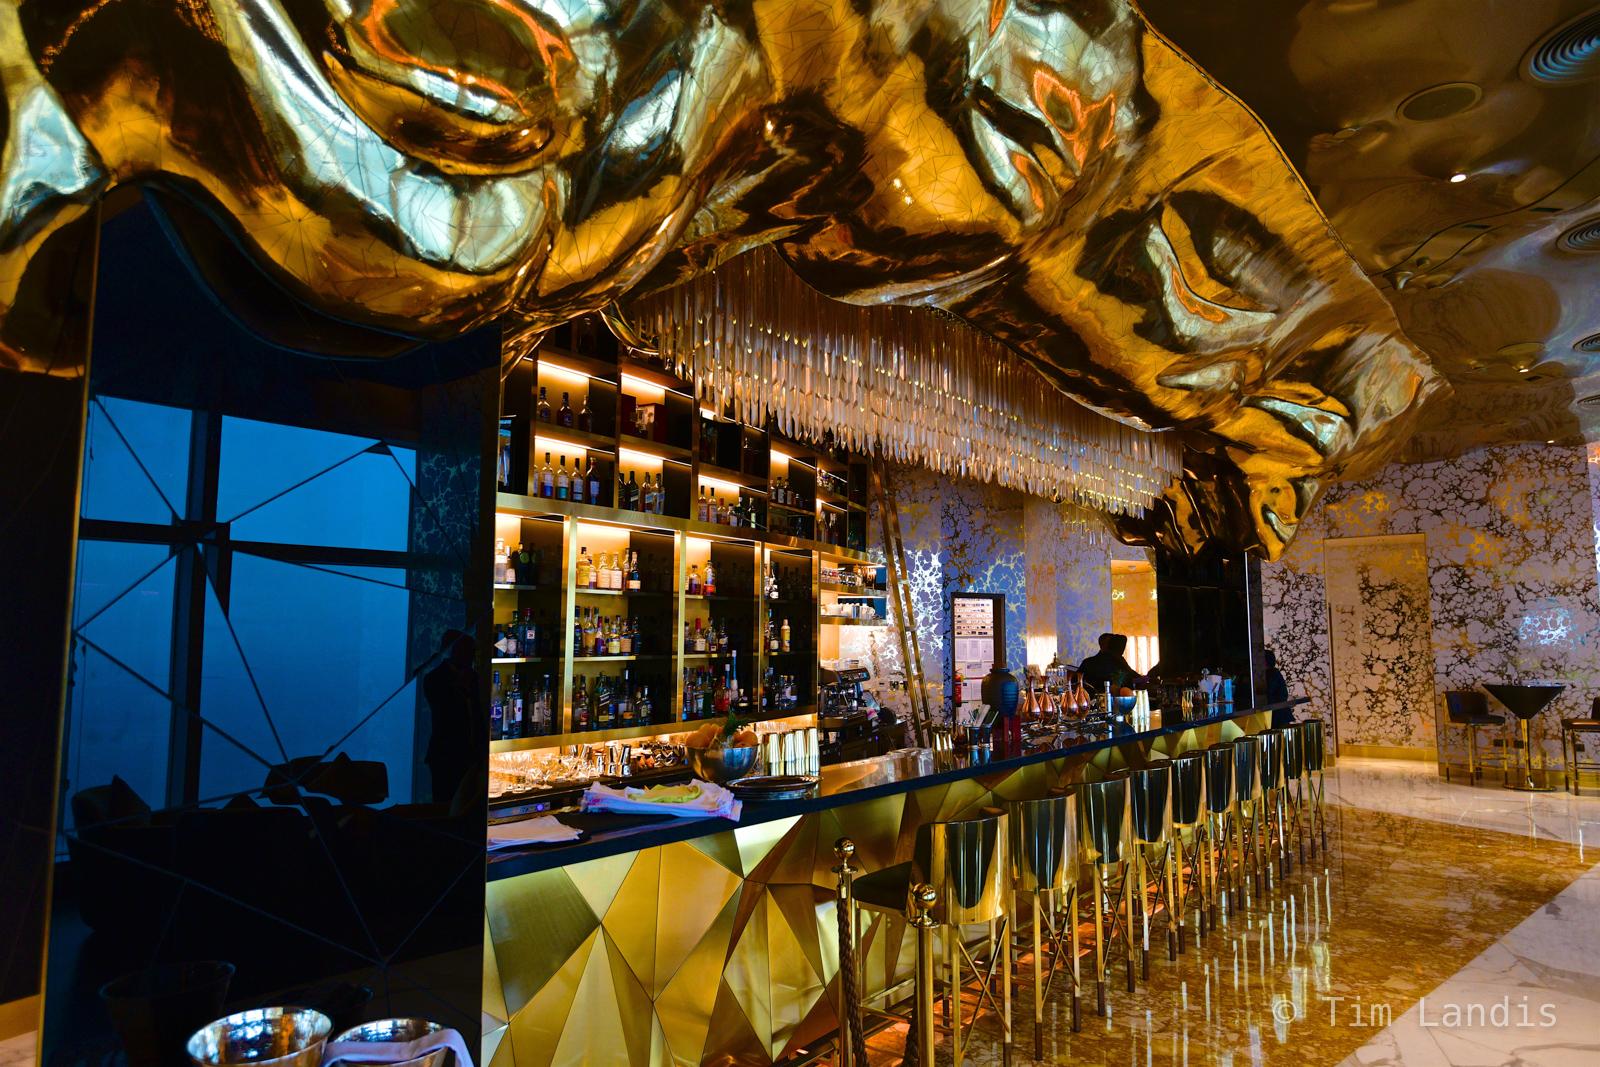 27 karat with Crystals, 27 karat bar, Burj al Arab, golden bar, photo